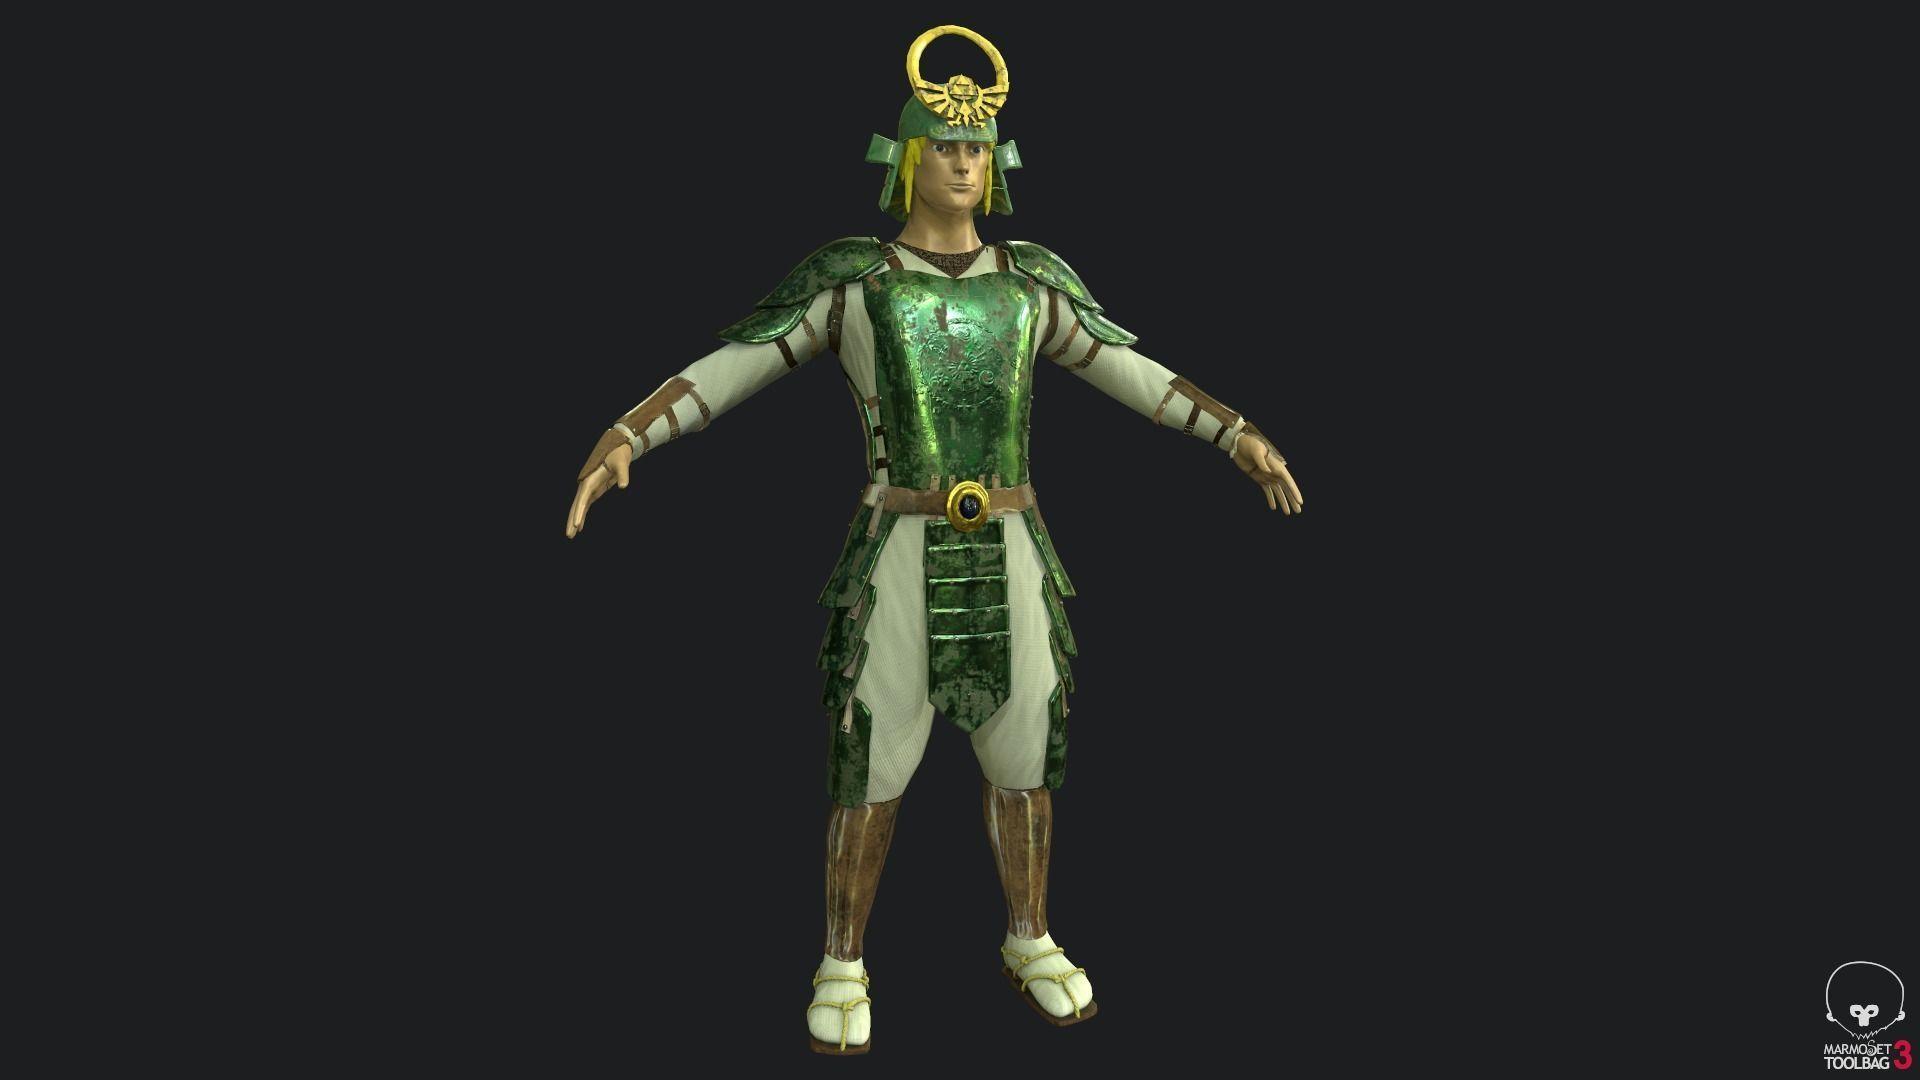 Samurai Link